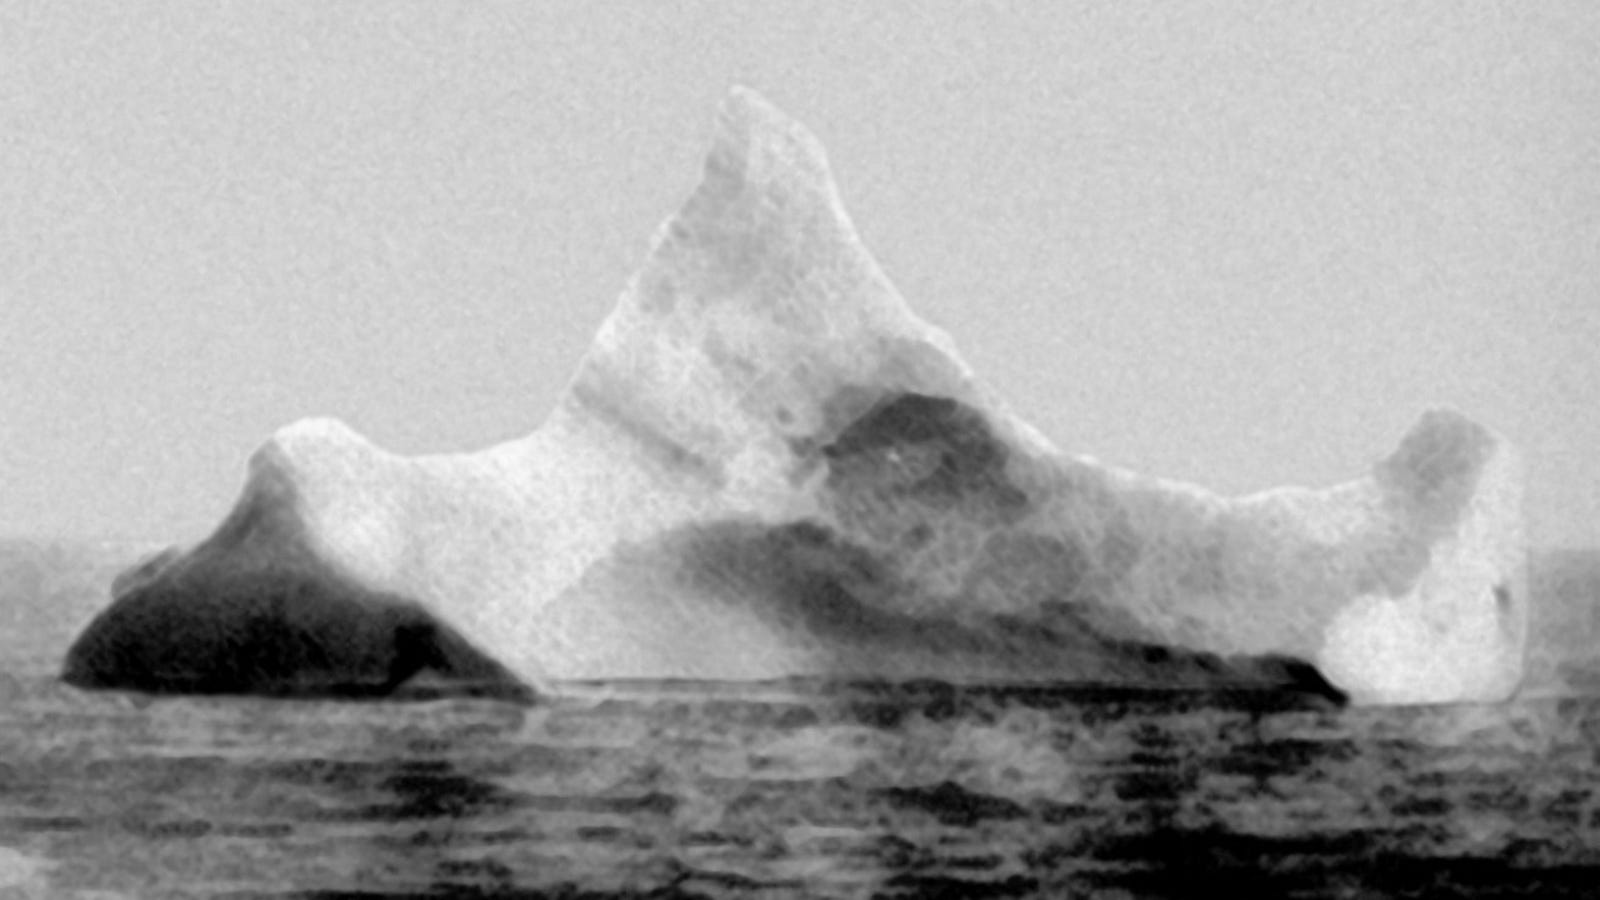 Whatever happened to the iceberg that sank the Titanic?